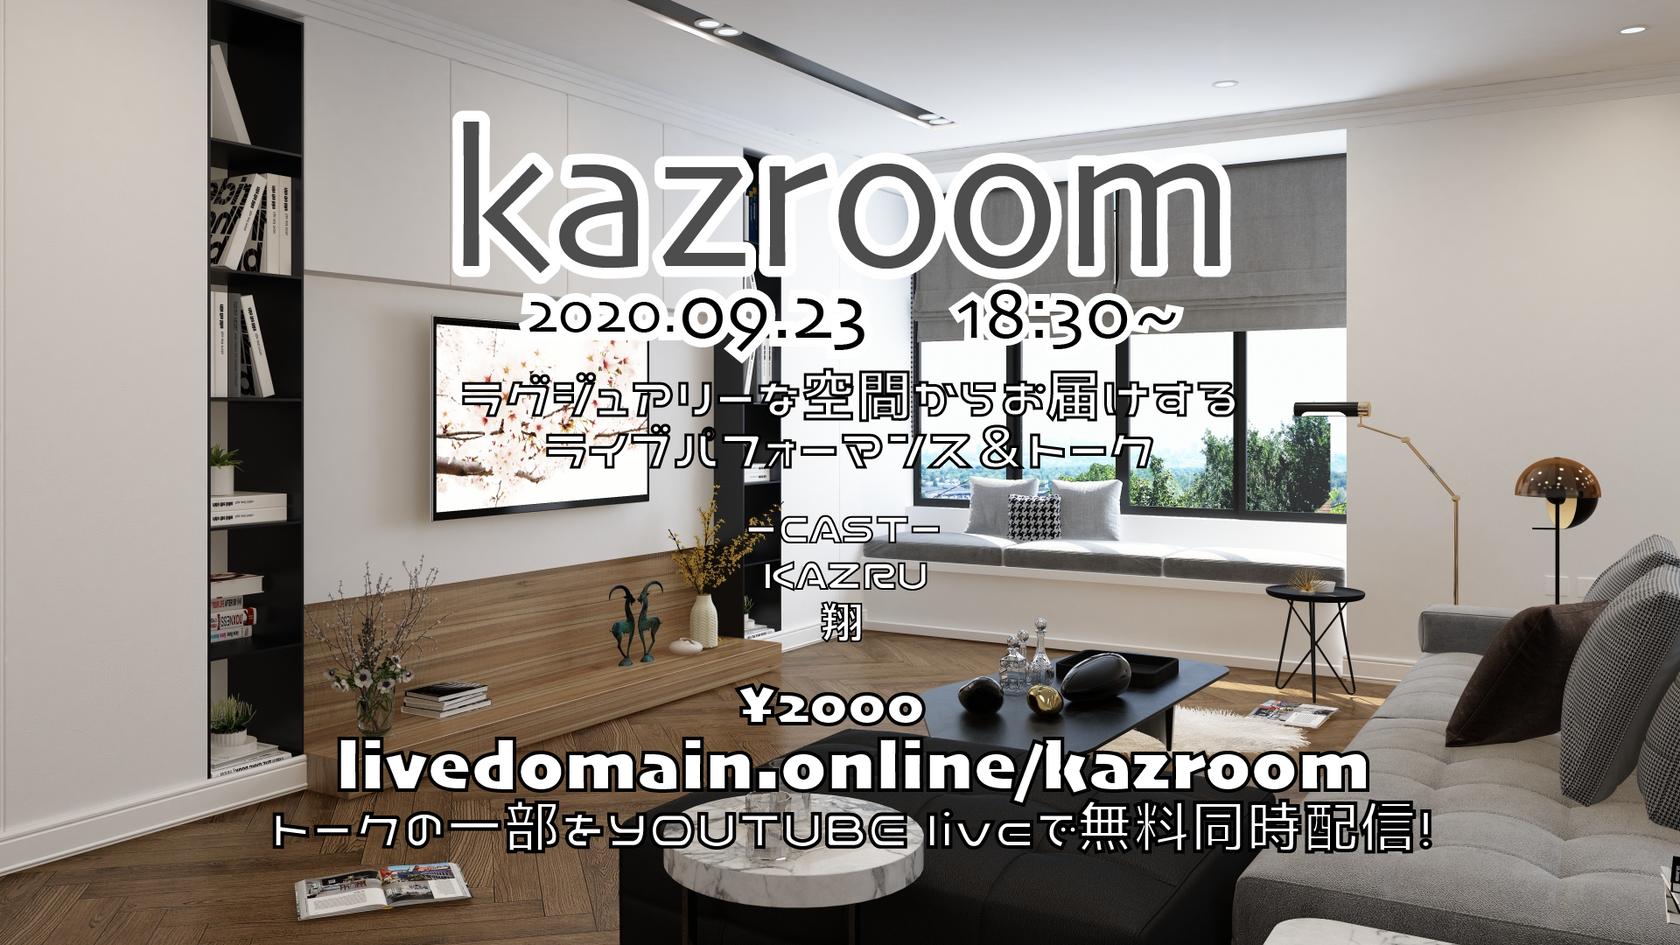 kazroom